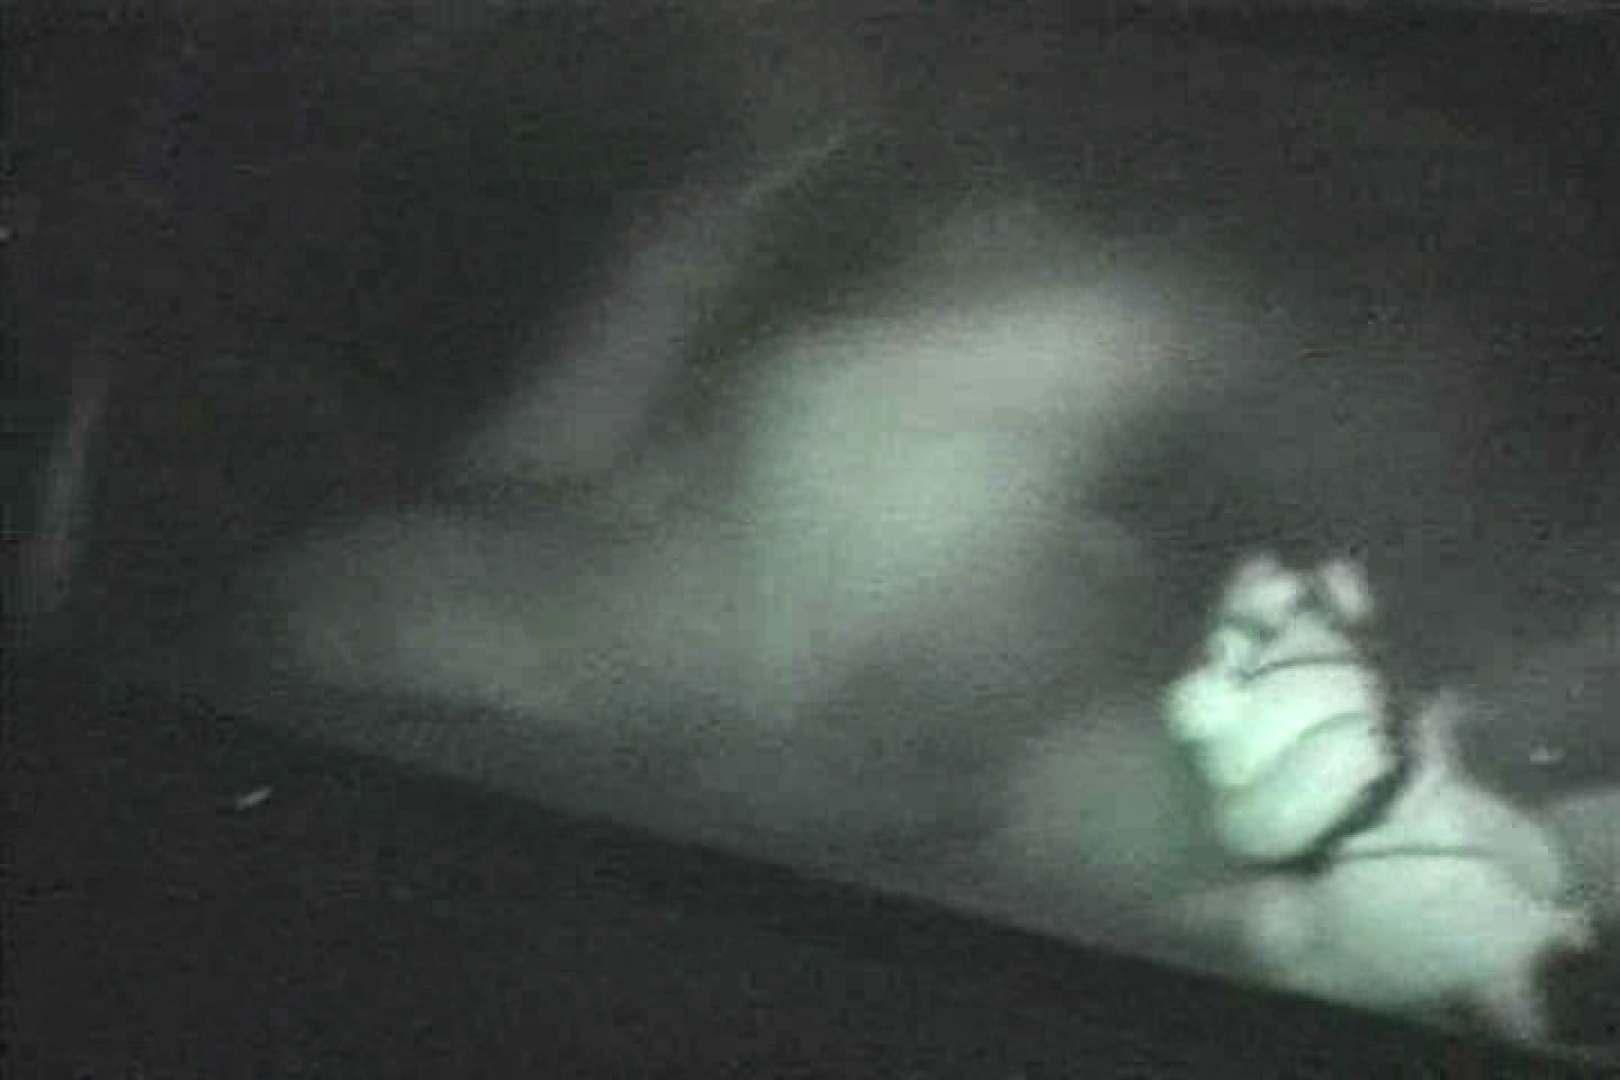 MASAさんの待ち伏せ撮り! 赤外線カーセックスVol.11 赤外線 のぞき動画画像 77pic 70